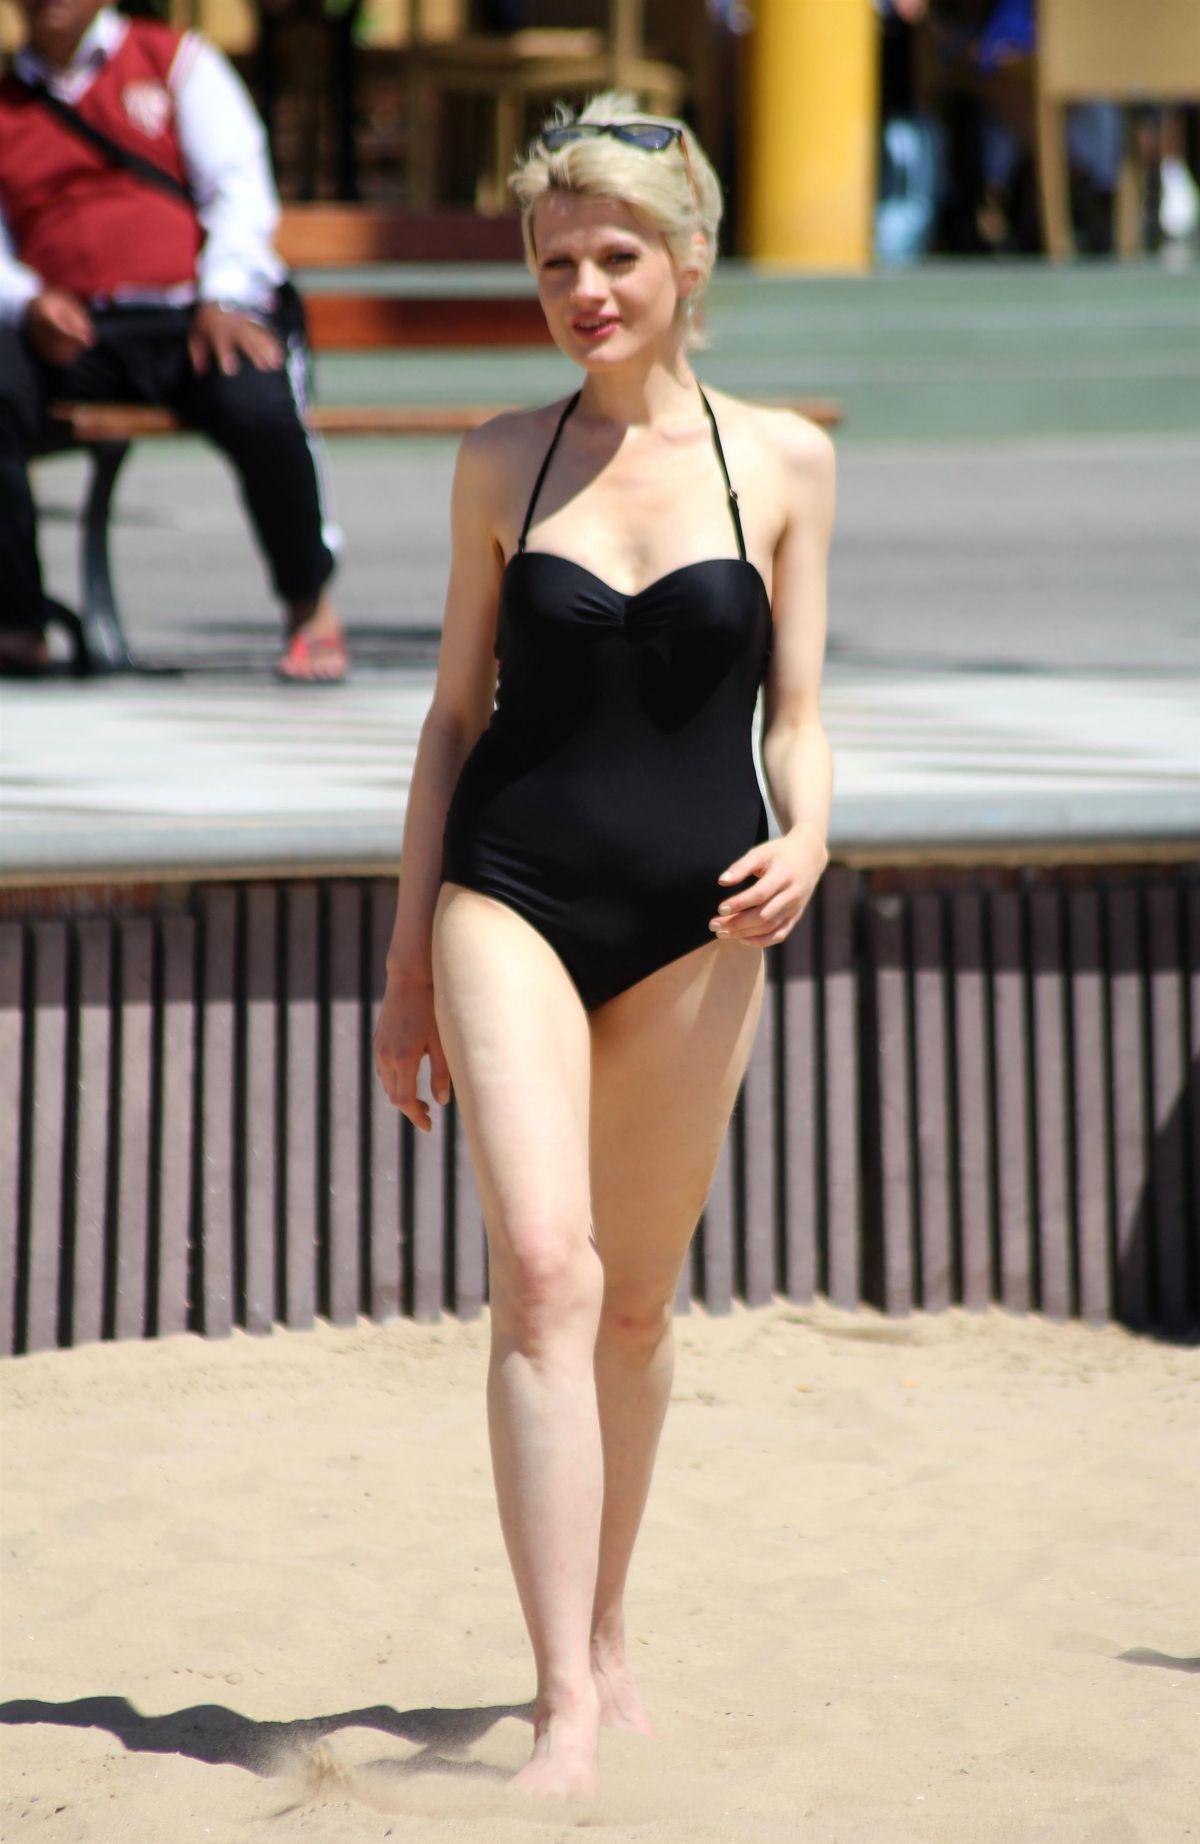 ICloud Chloe Jasmine naked (37 photo), Topless, Fappening, Boobs, bra 2017